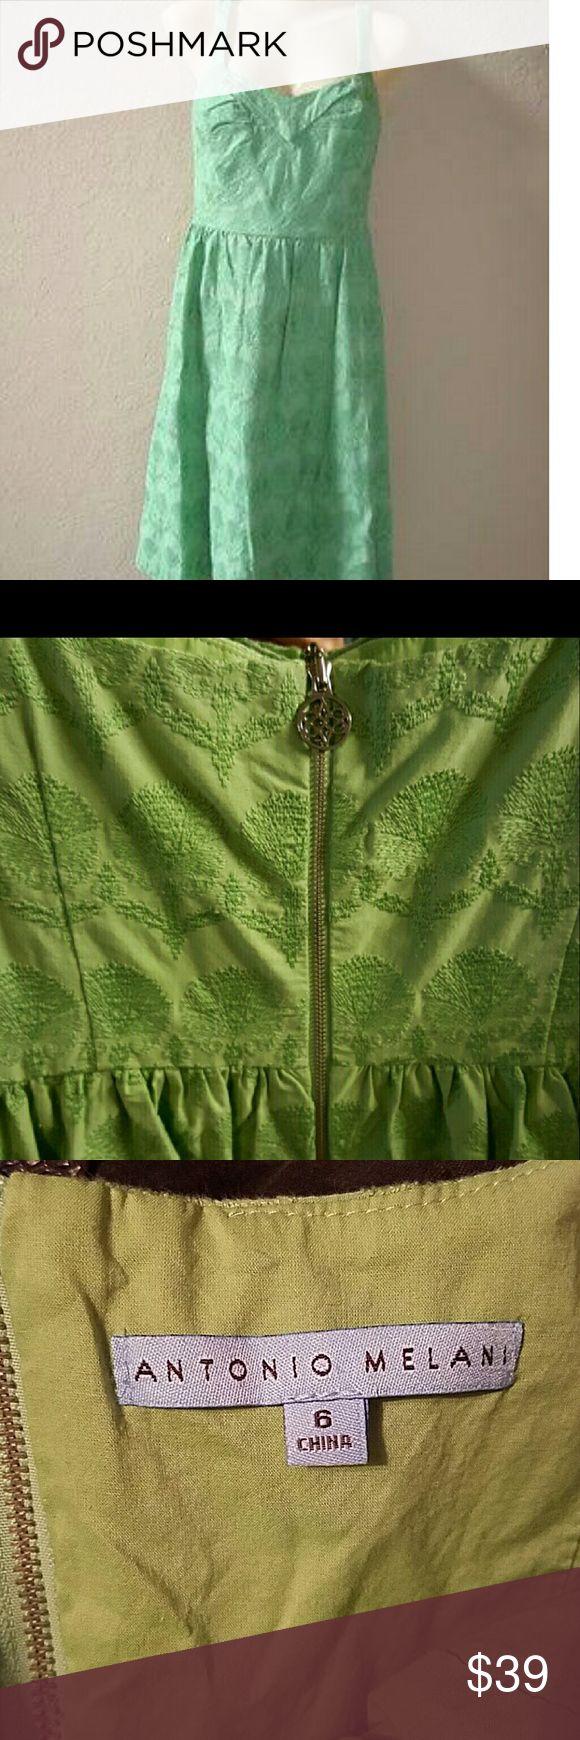 Antonio Melani Mint Green Dress EUC Size 6 Antonio Melani dress. Embroidered floral pattern. Excellent condition. Non smoking home. Reasonable offers welcome, but no trades:) ANTONIO MELANI Dresses